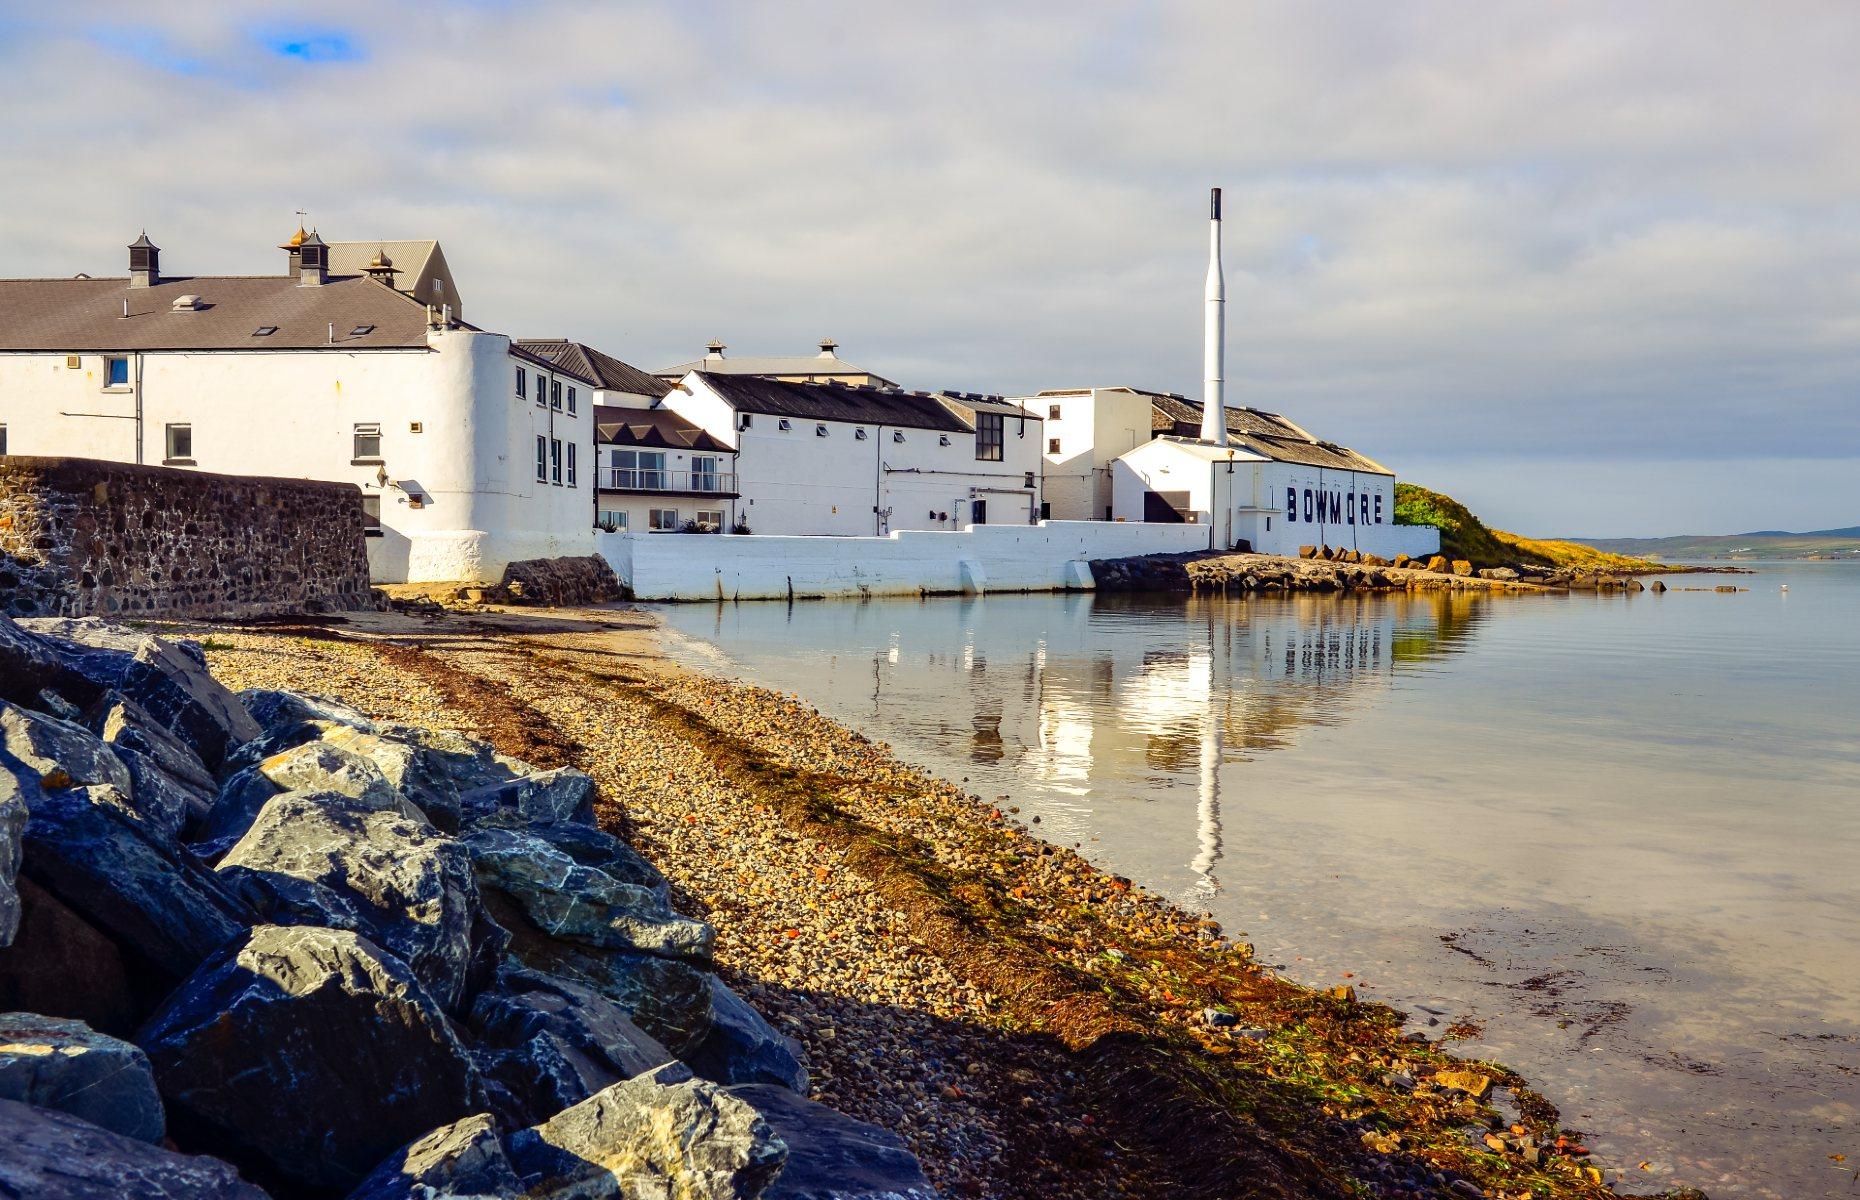 Bowmore distillery (Image: Martin M303/Shutterstock)